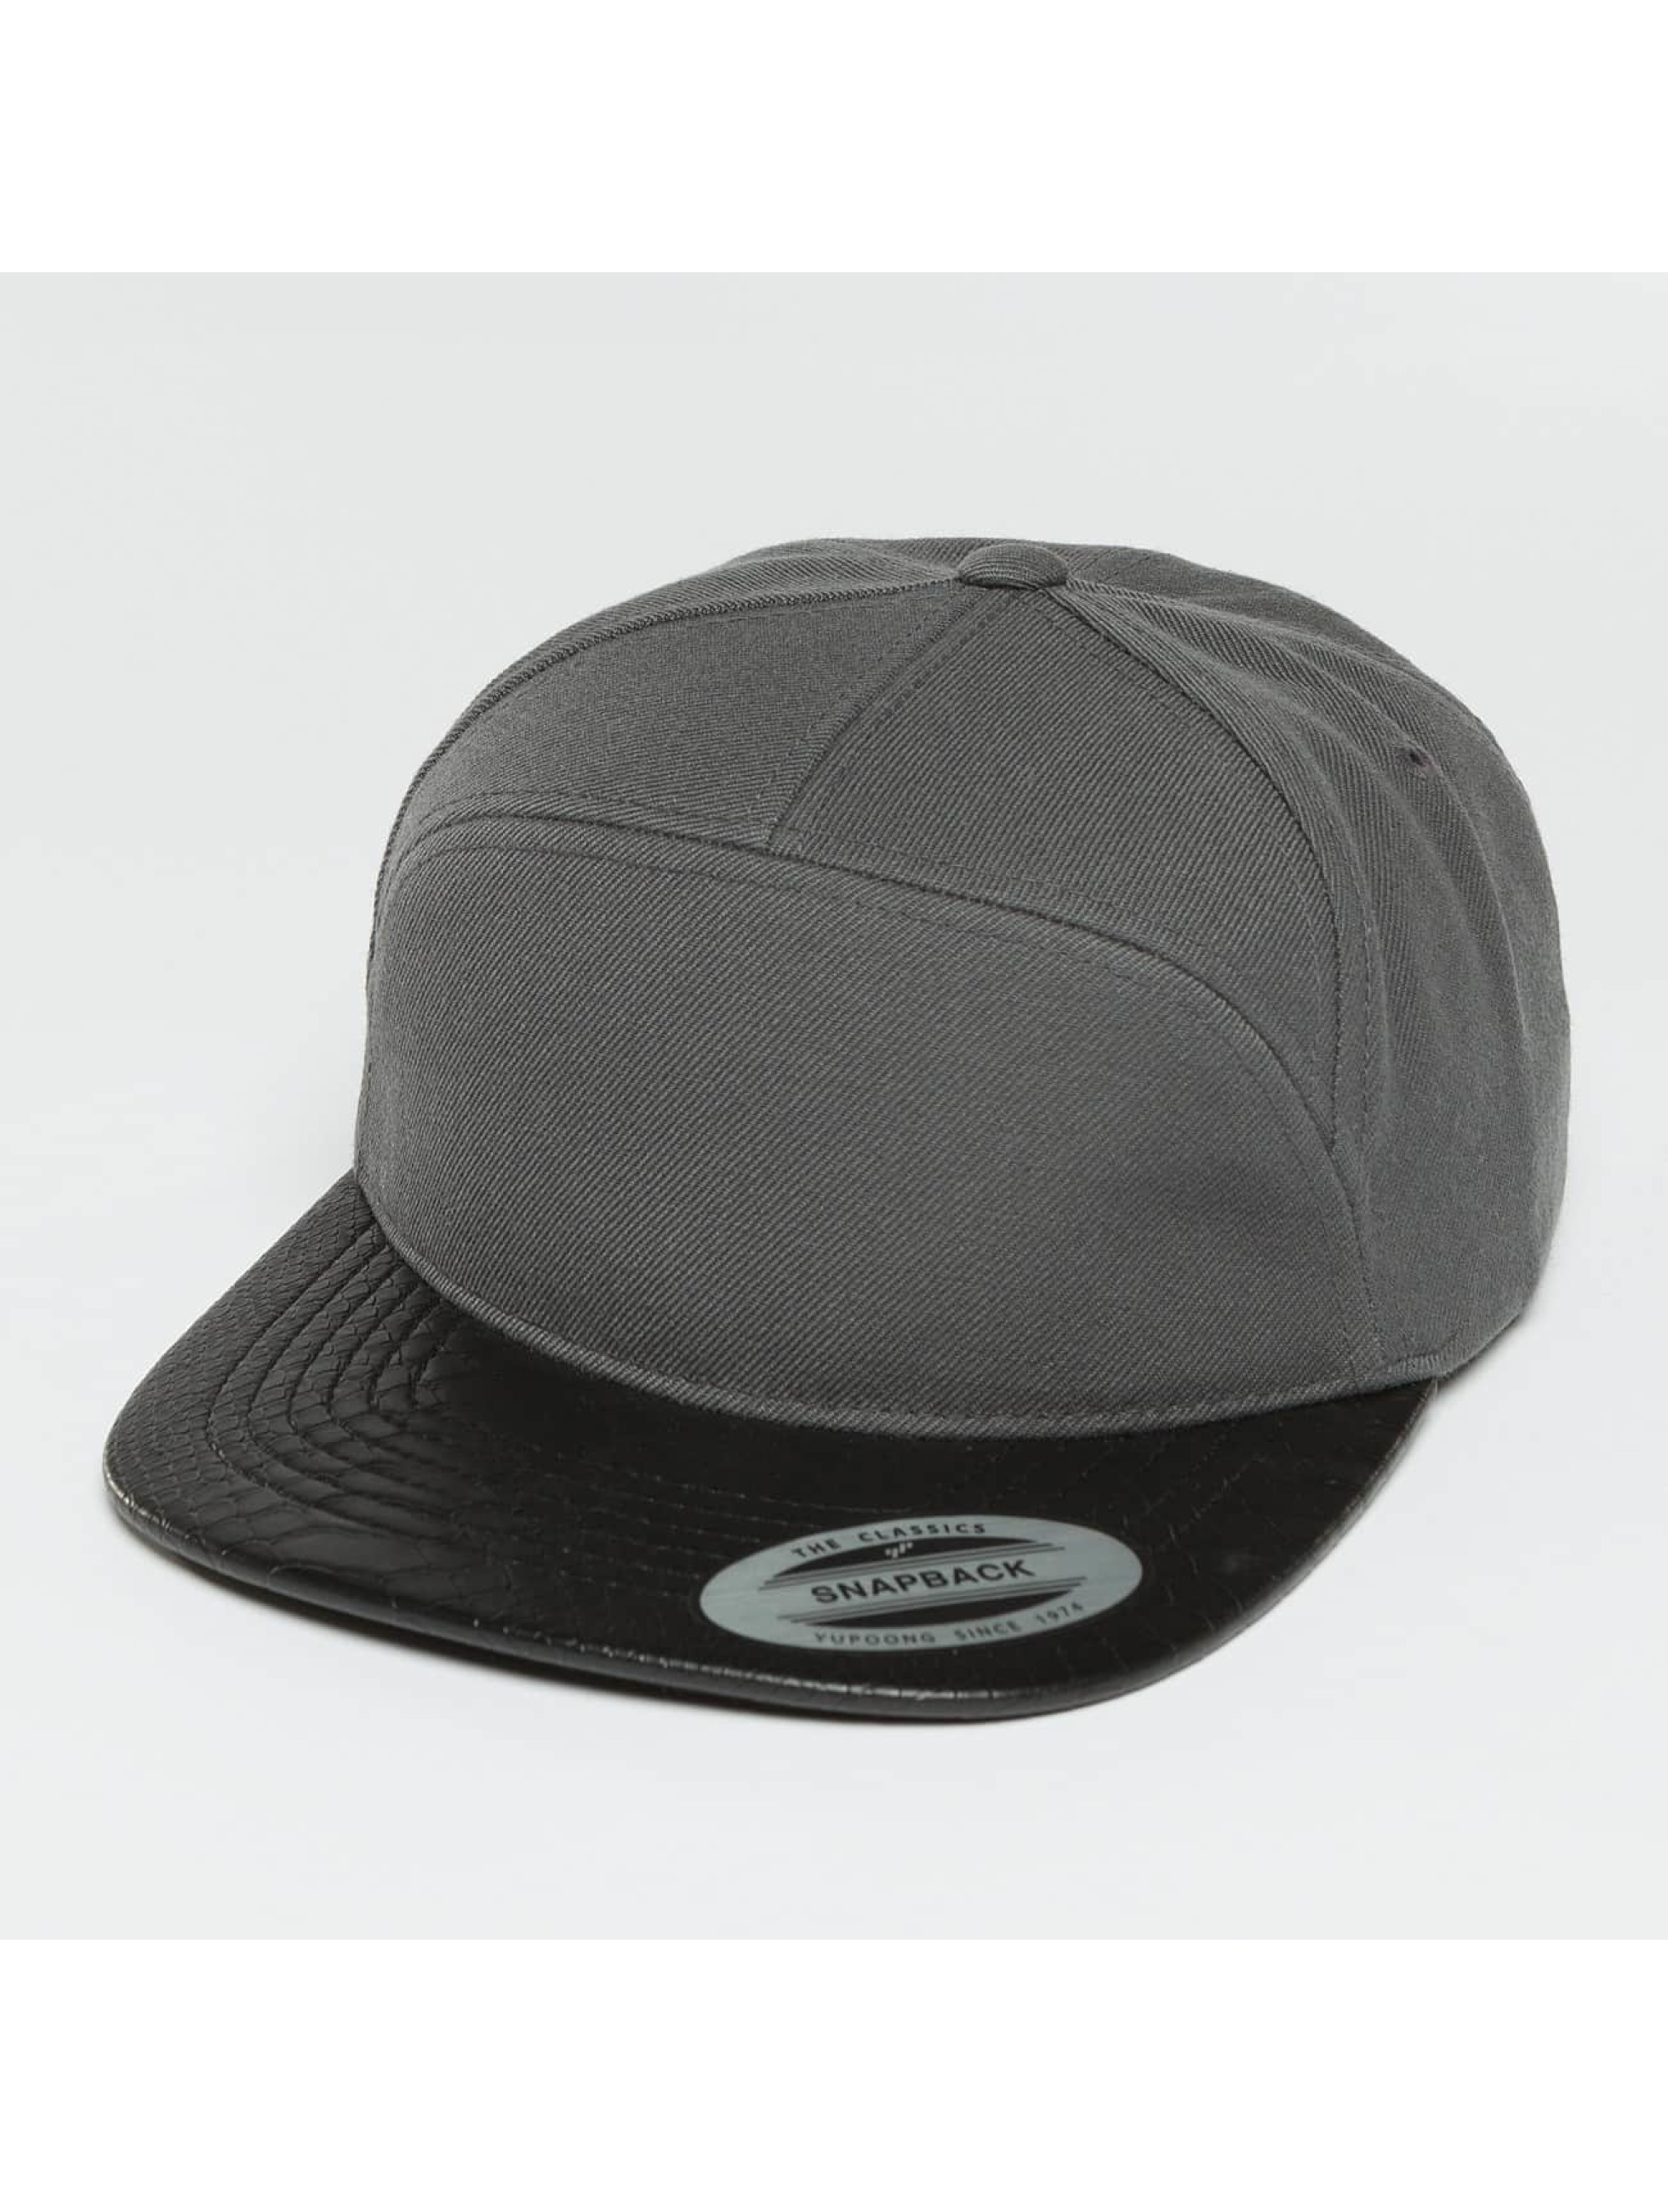 Flexfit Männer,Frauen Snapback Cap Arch in grau